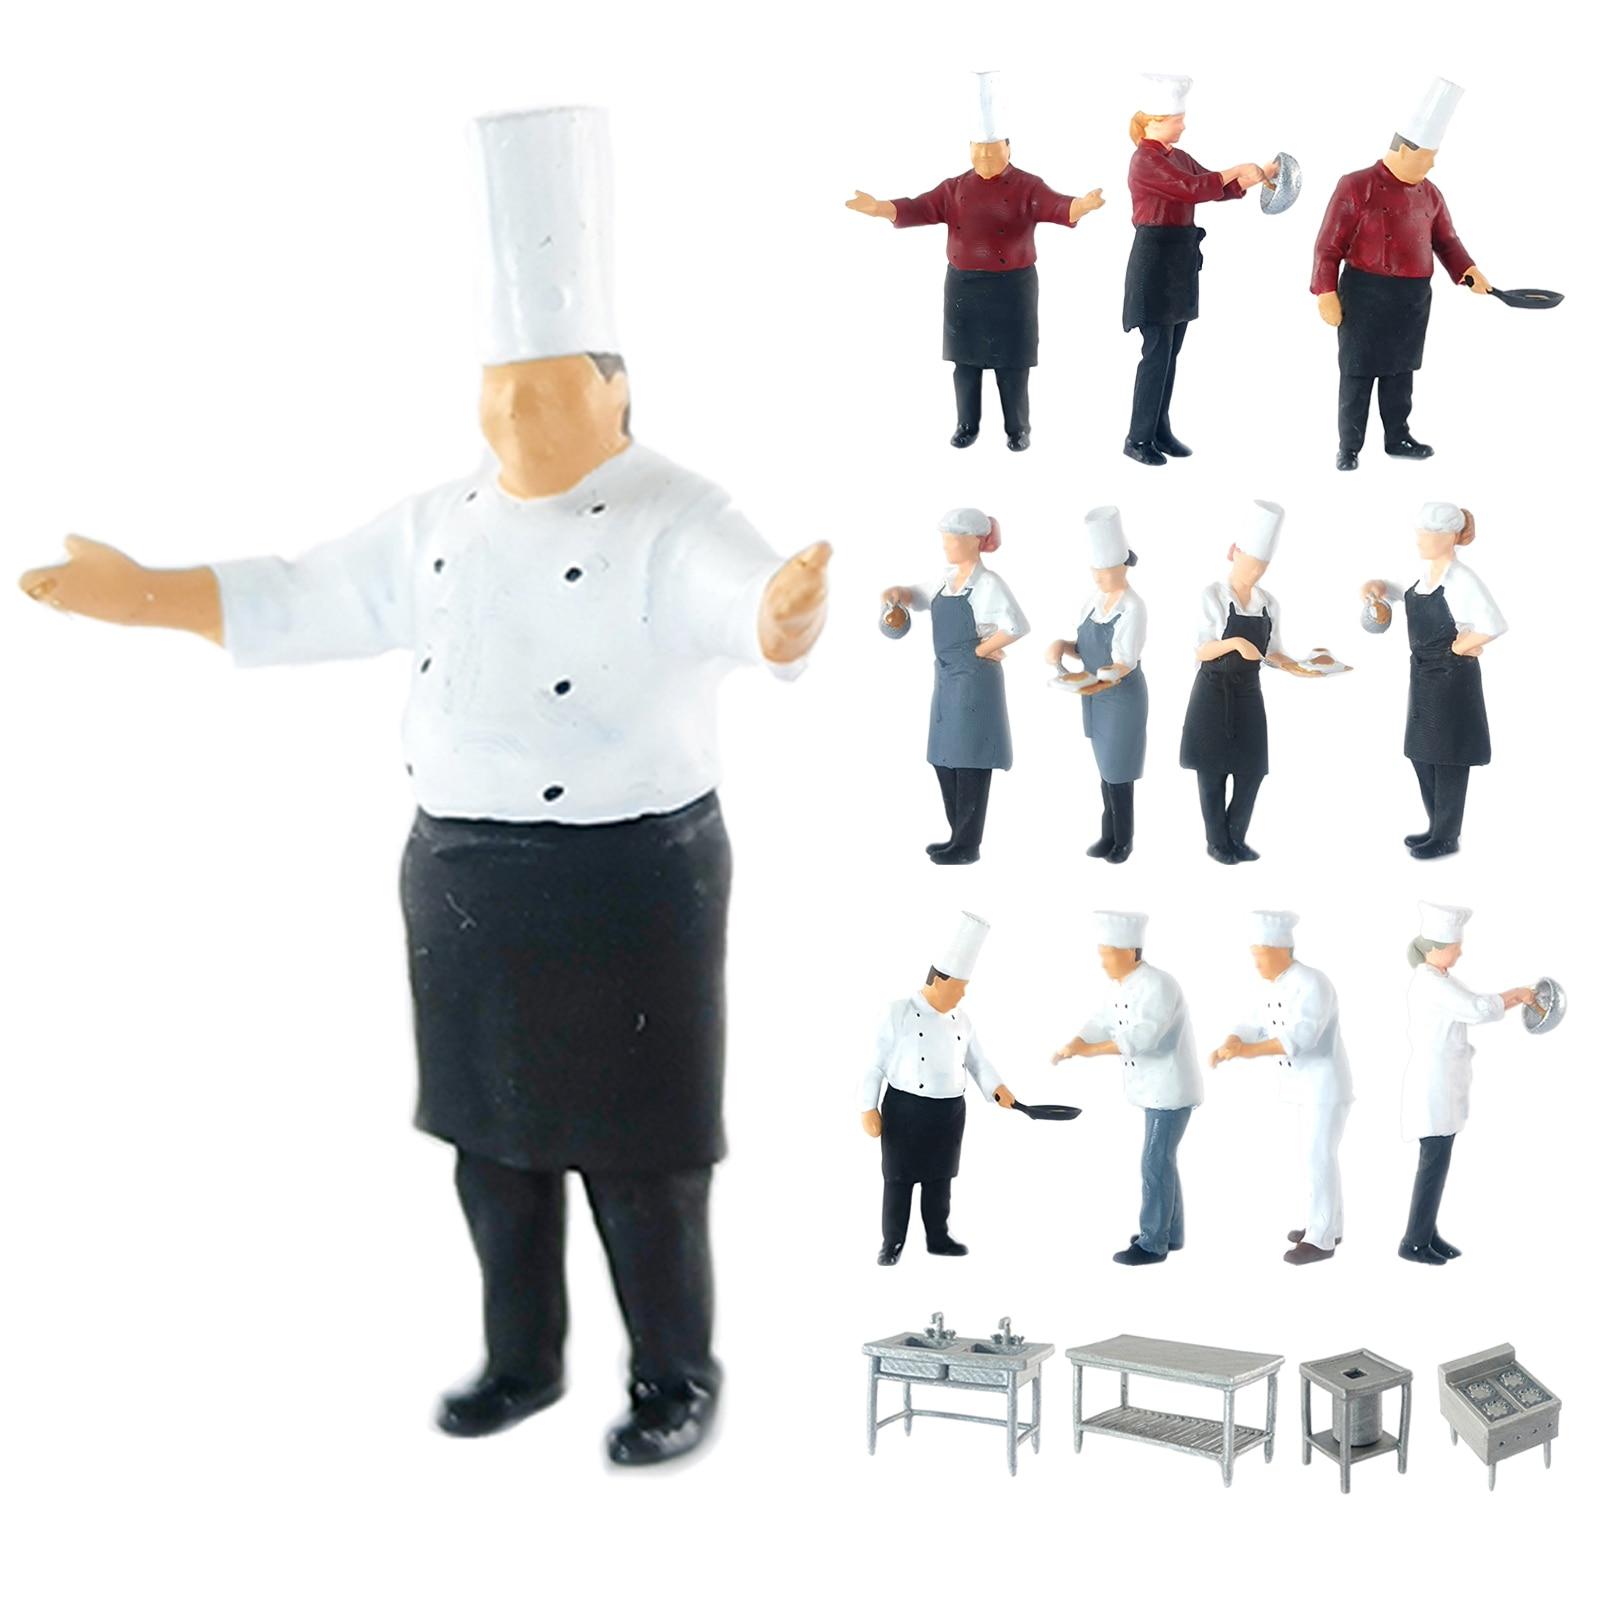 Cook Chef Figurines Figures Restaurant Chef Figurines for Miniature Scenes